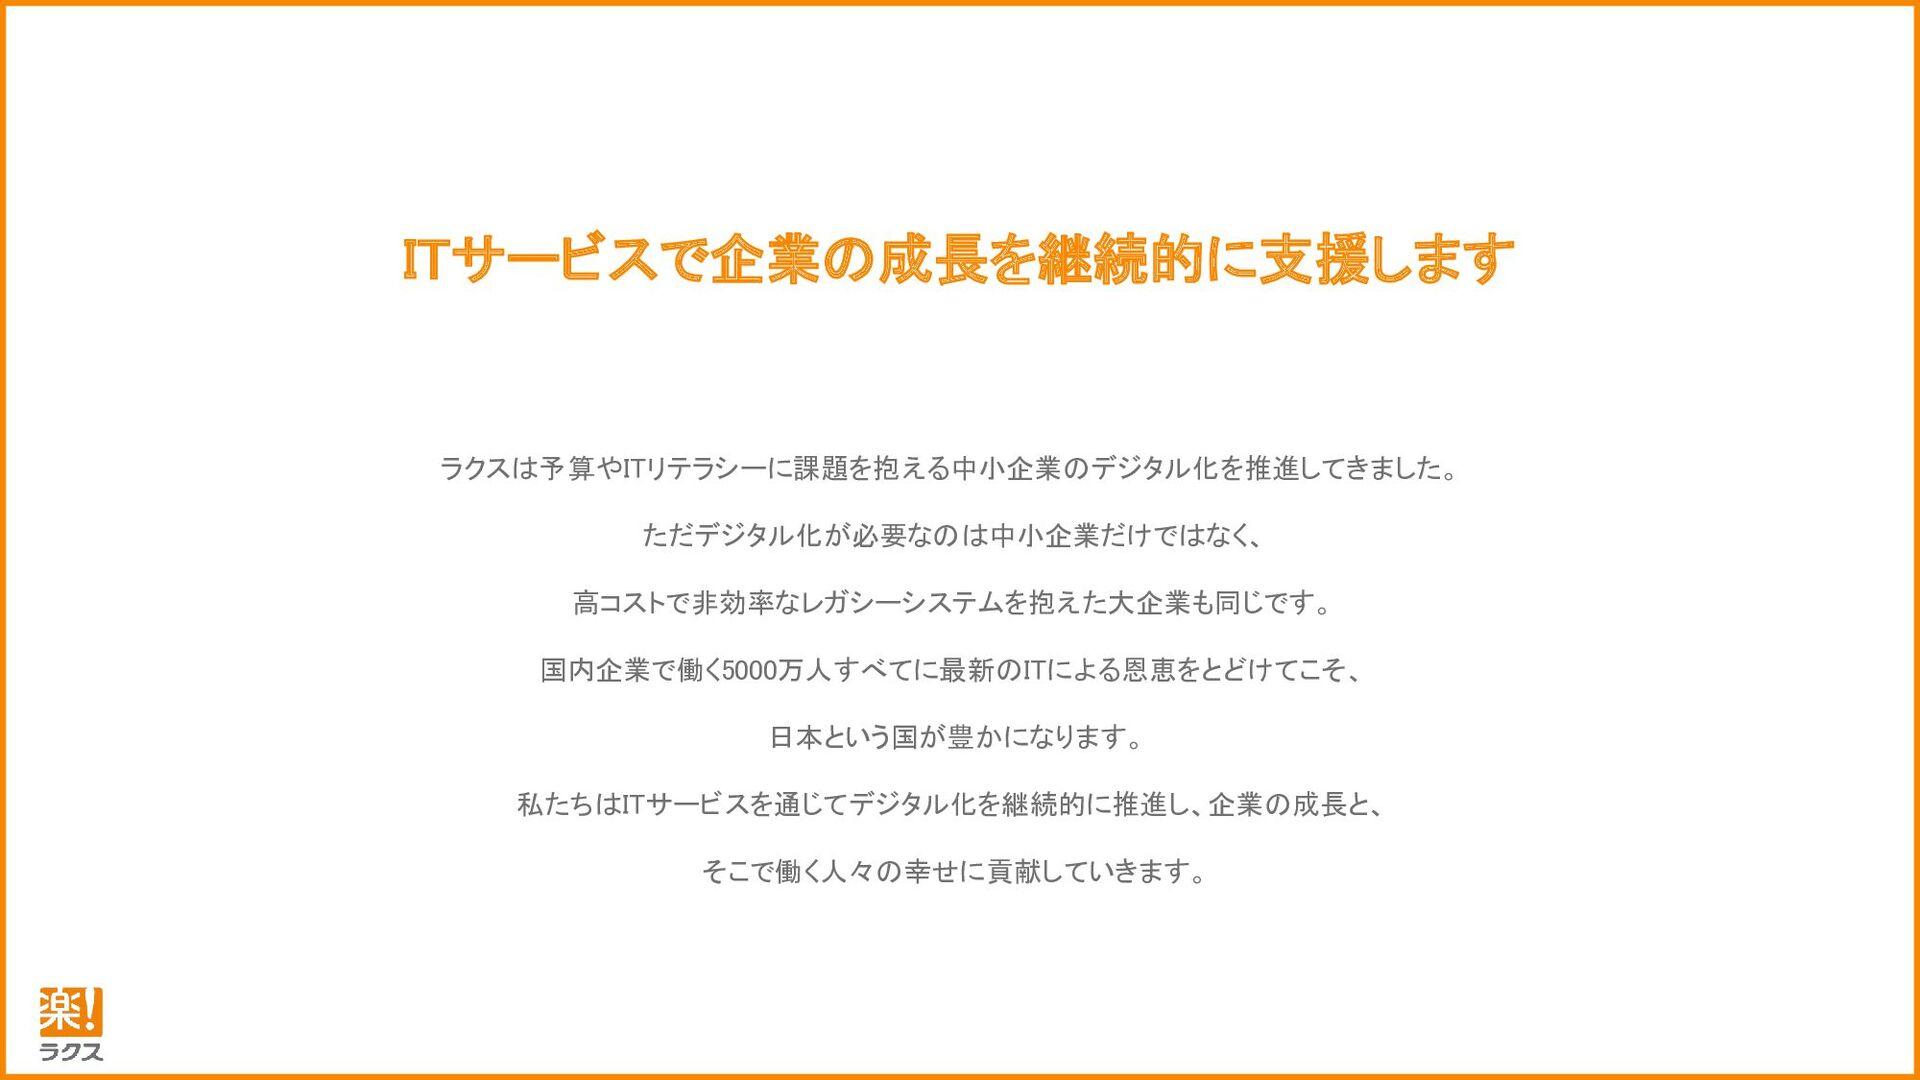 IT技術で中小企業を強くします! すぐ便利、ずっと満足。 日 本 の 9 割 以 上 の 企 ...